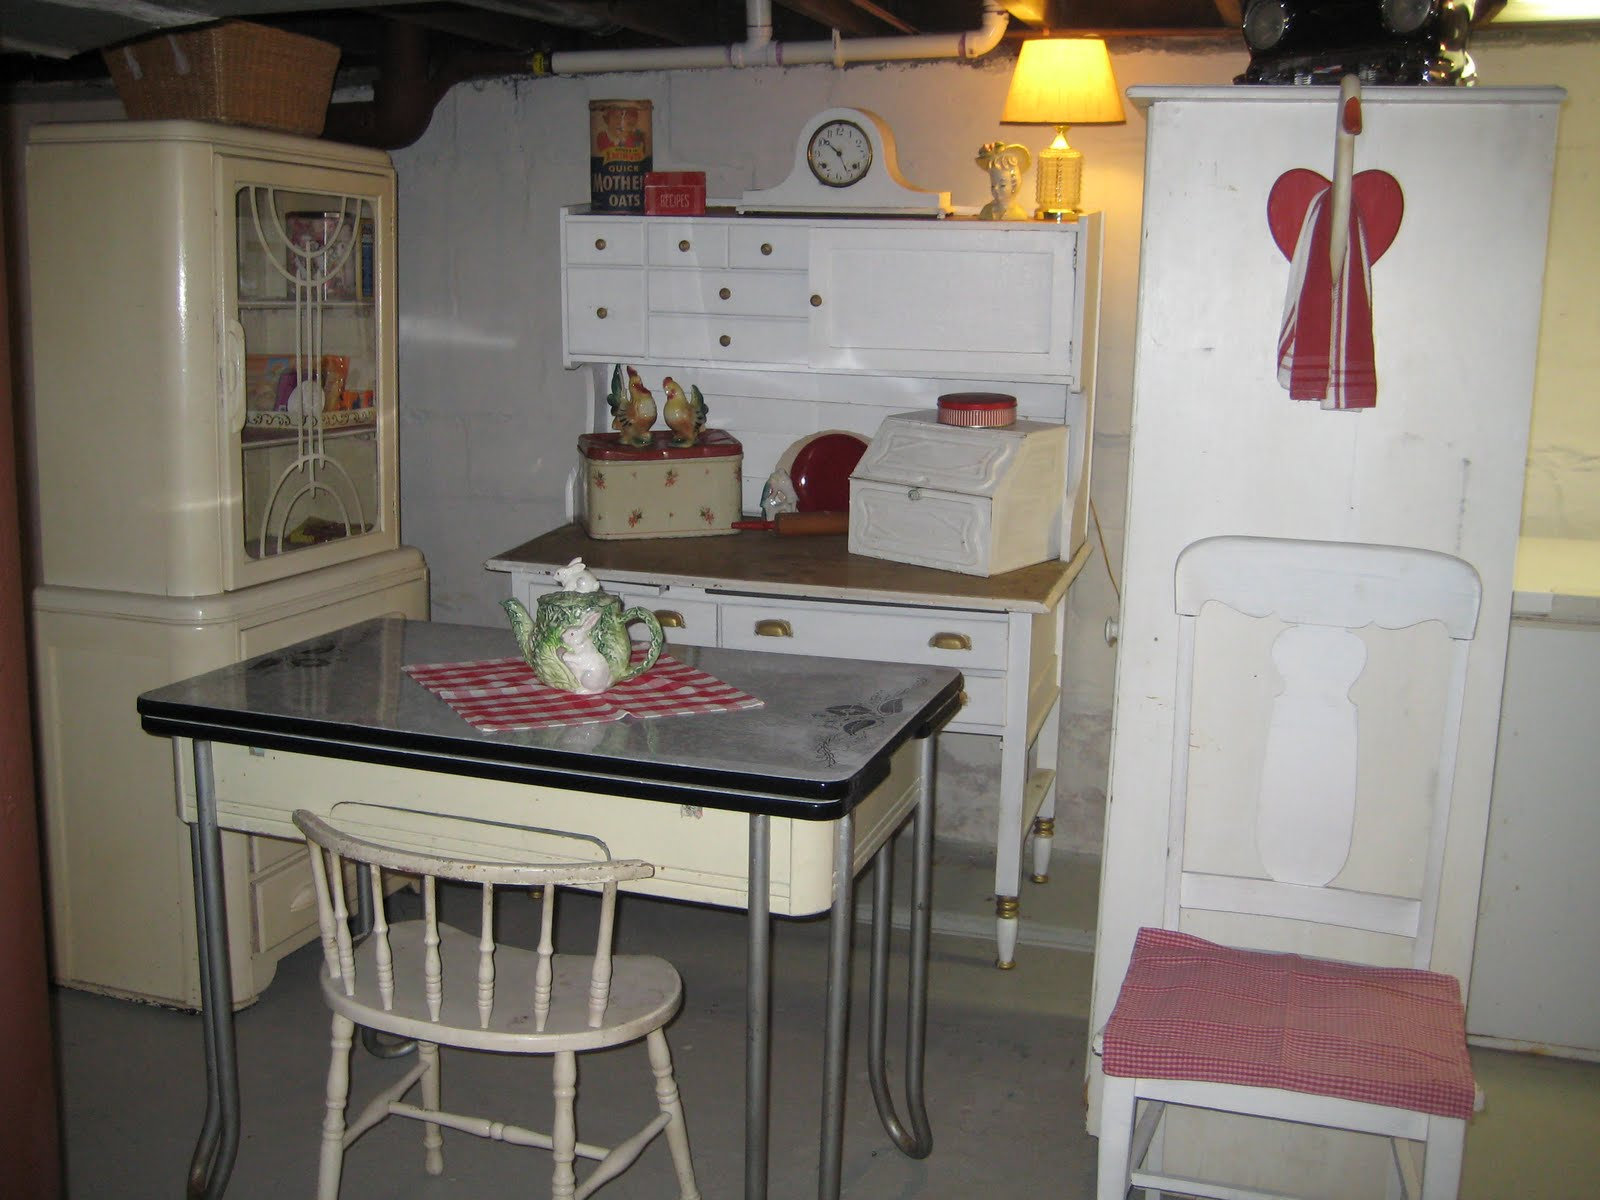 1920 kitchen design ideas - photo #18